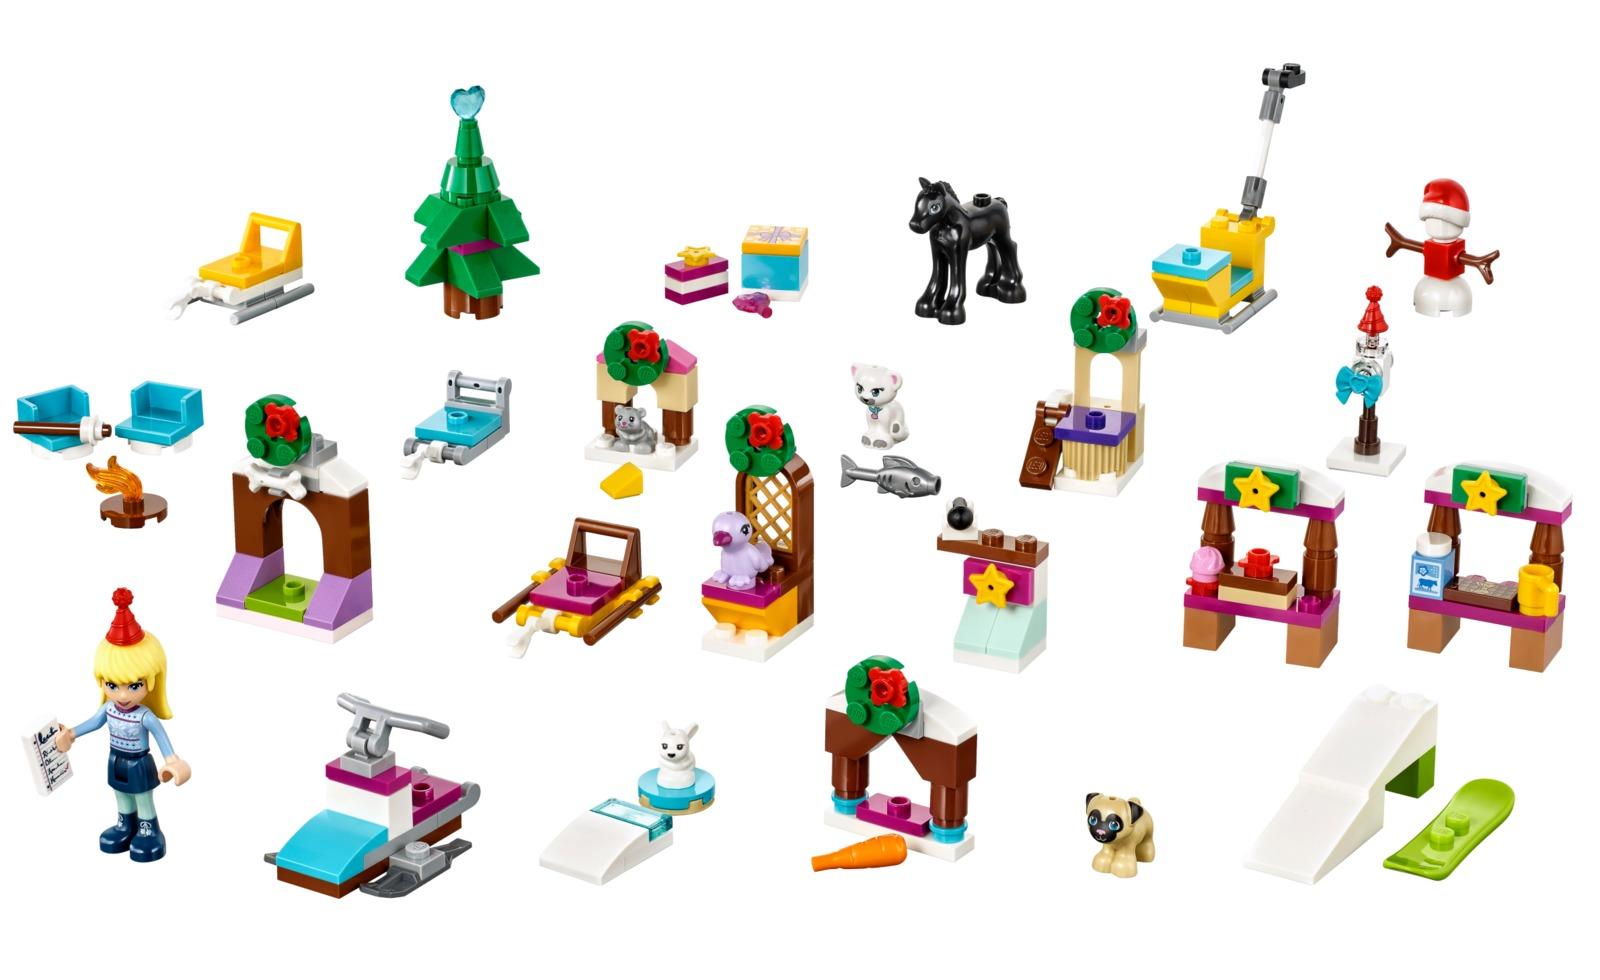 LEGO Friends: Advent Calendar (41326) image